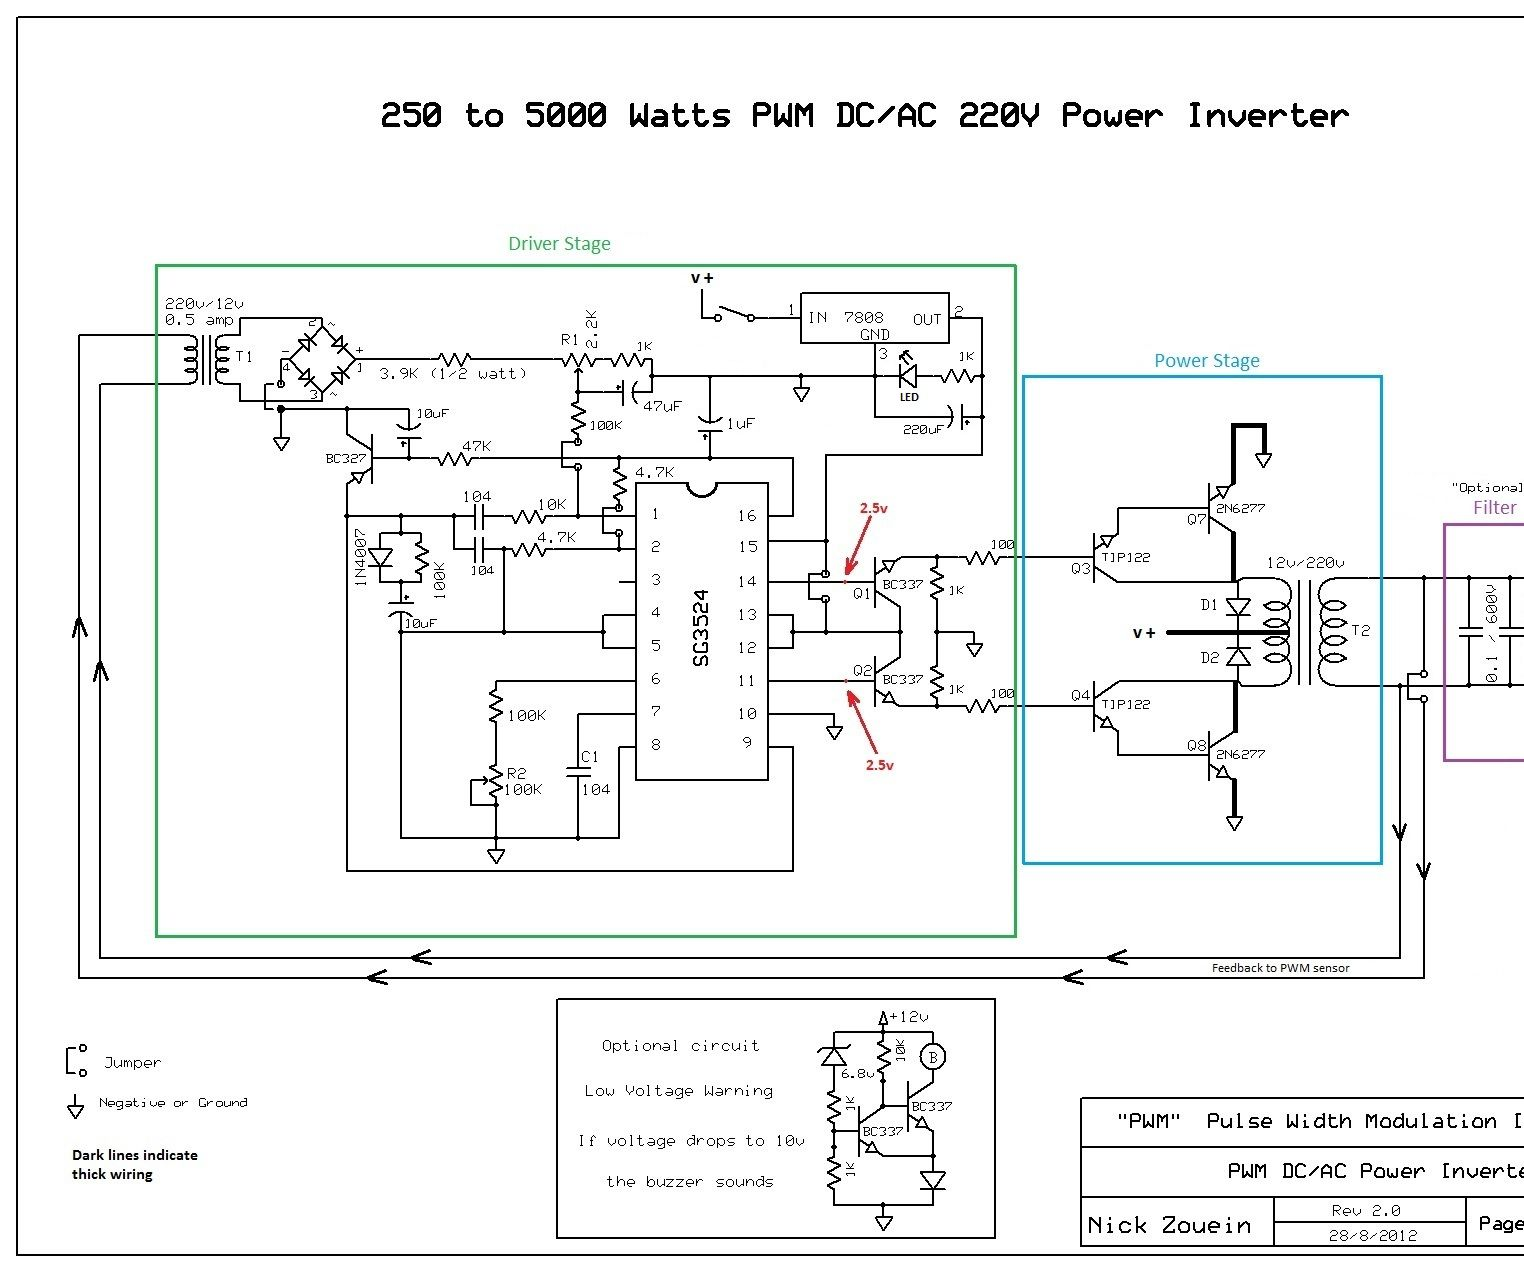 ka24e 2 4l engine diagram wiring diagram featured ka24e 2 4l engine diagram [ 1524 x 1270 Pixel ]